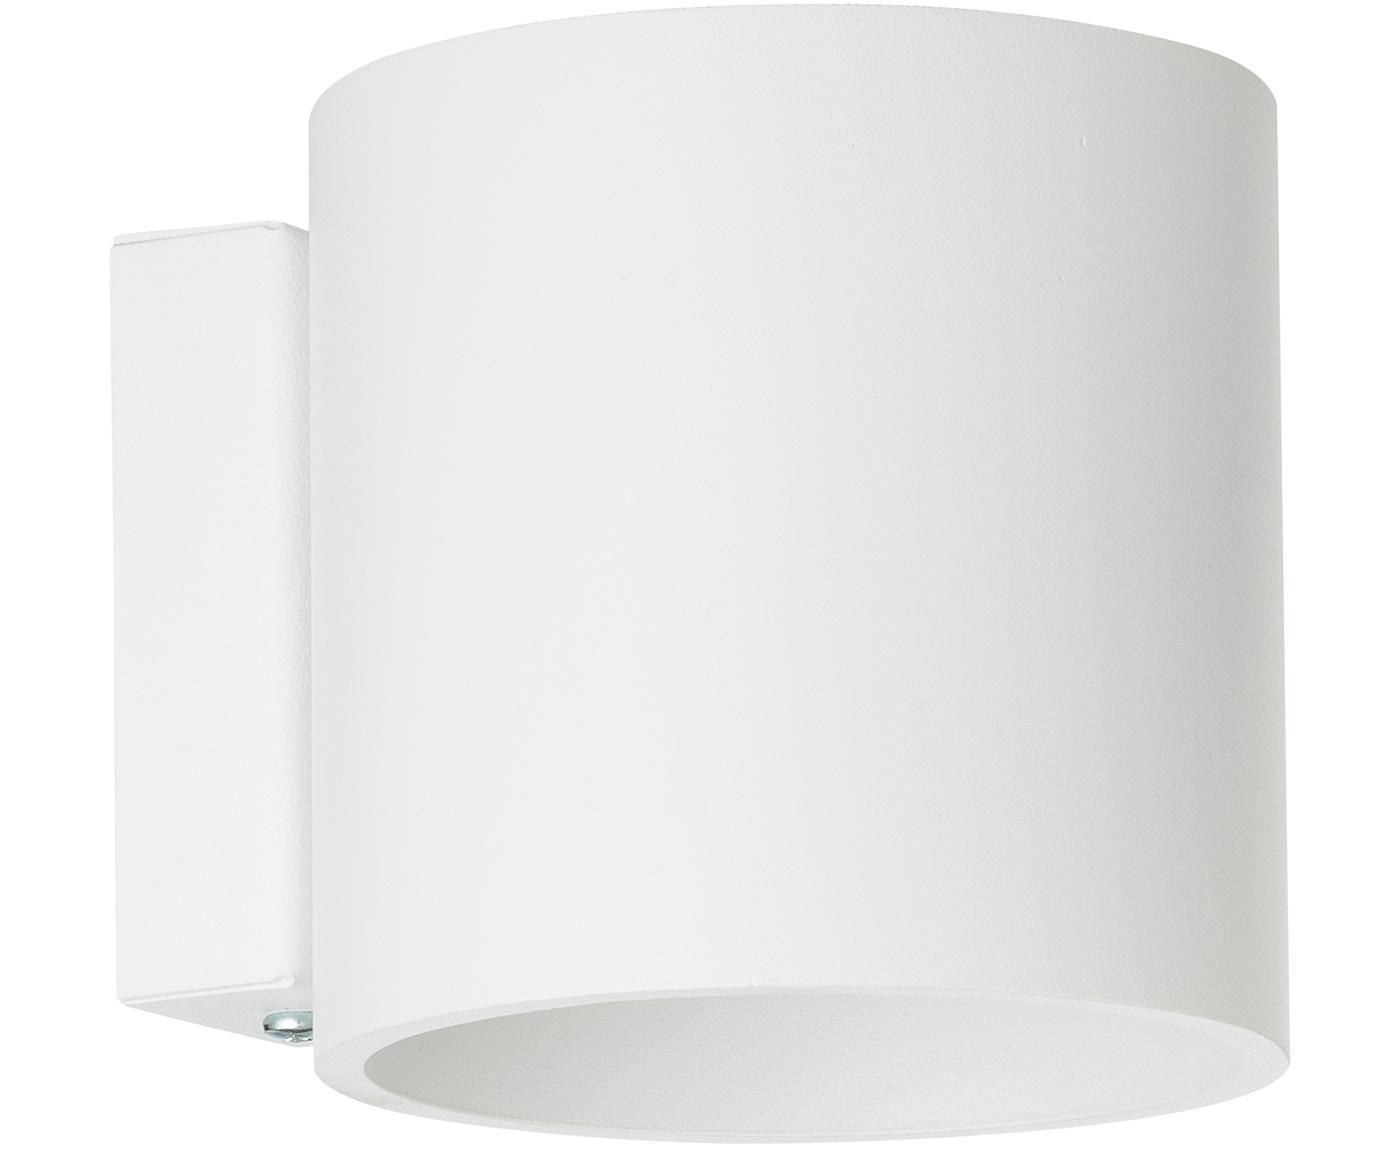 Wandlamp Roda, Gepoedercoat aluminium, Wit, 10 x 10 cm